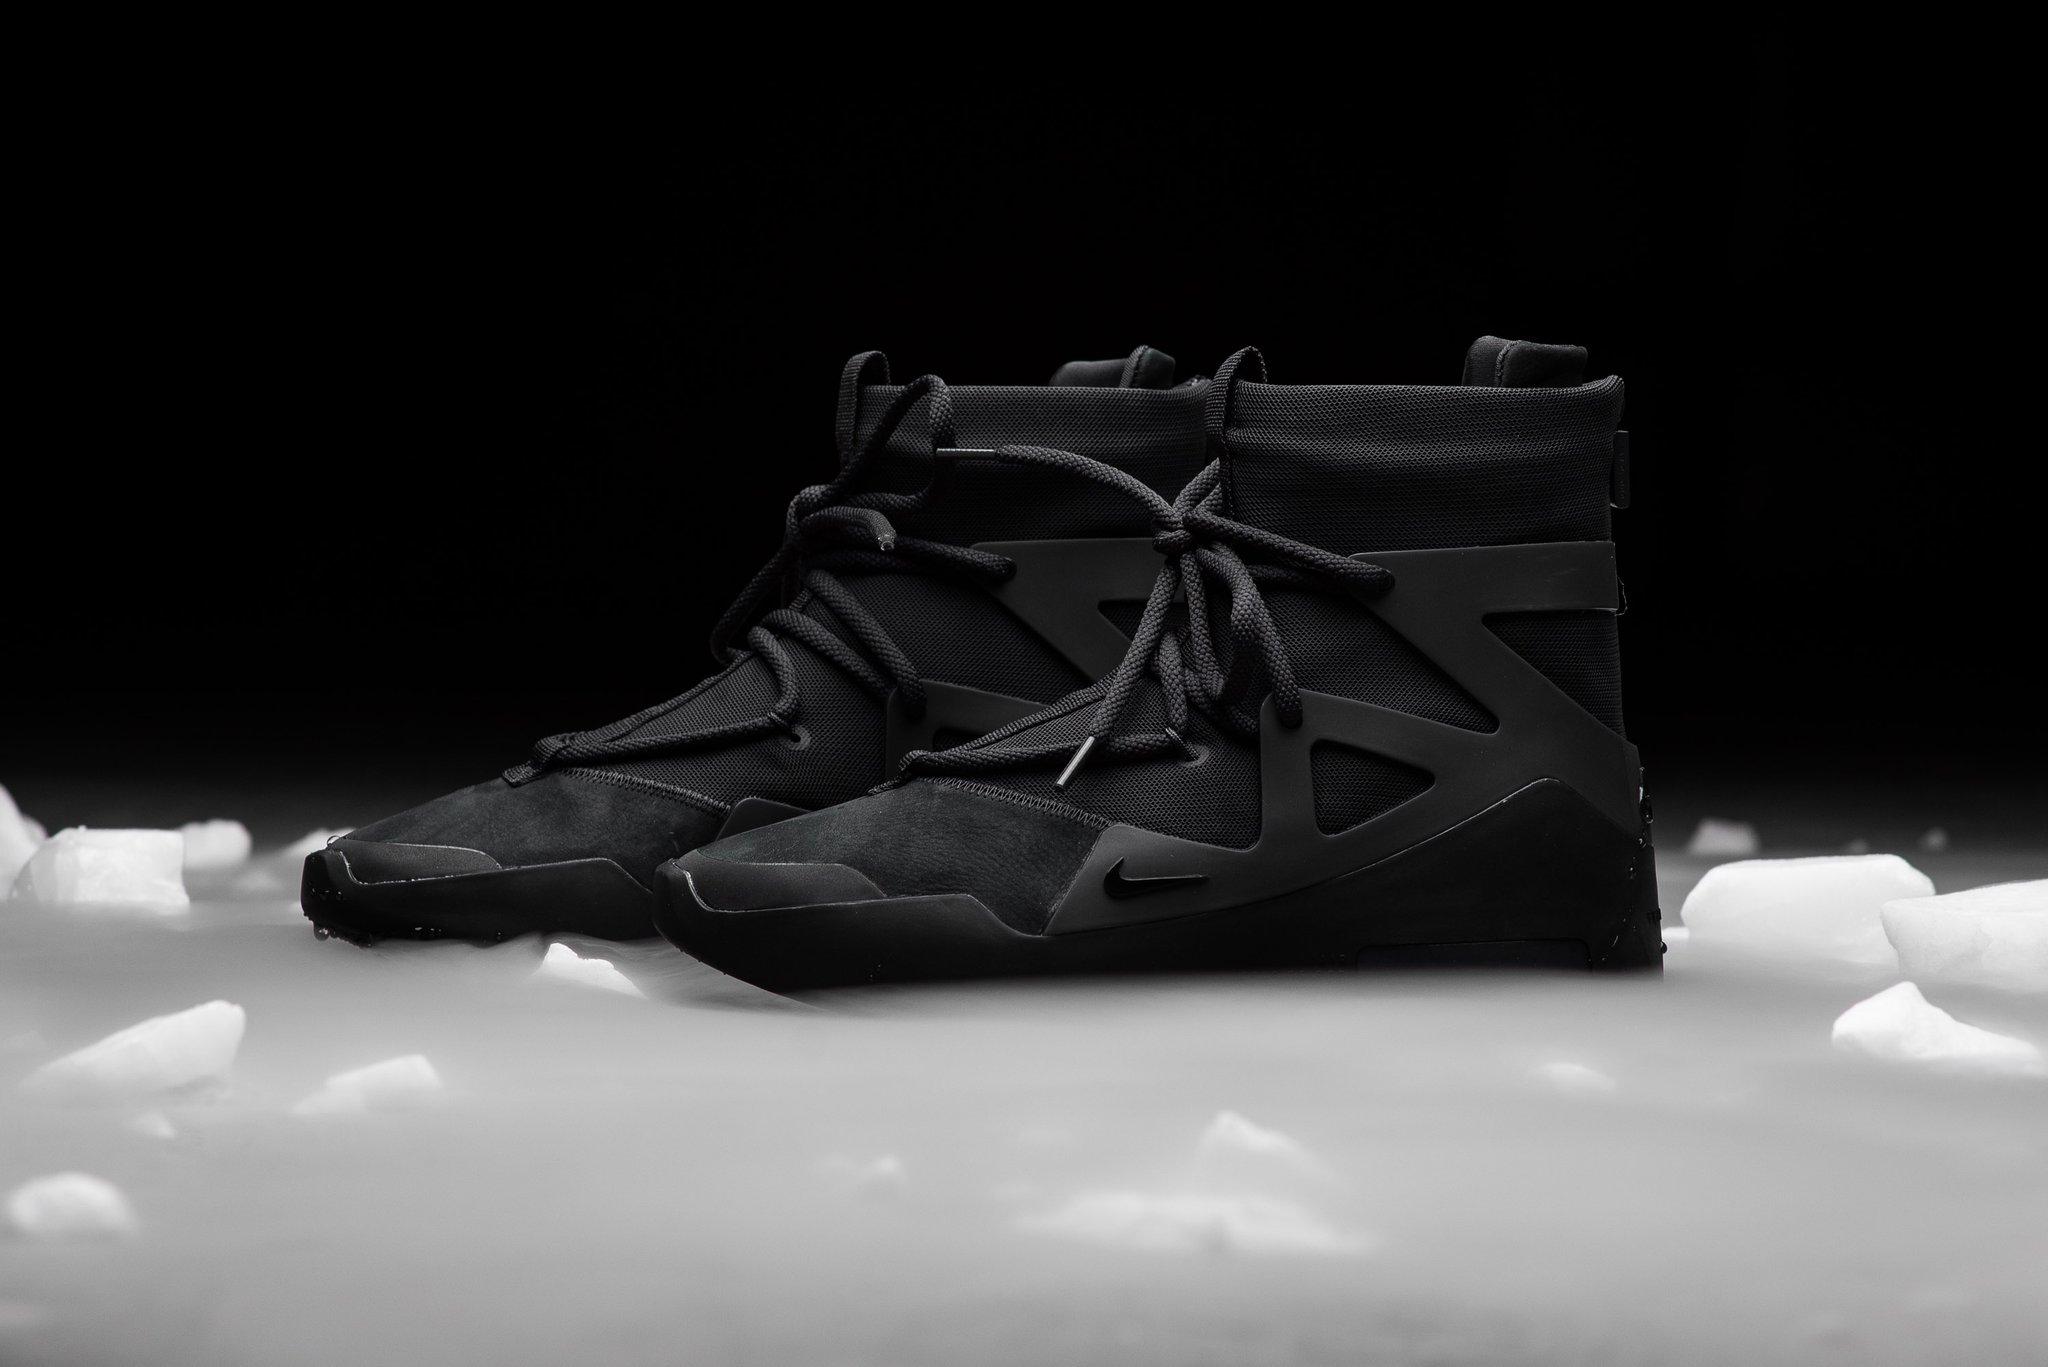 FOG,Nike,adidas,Jerry Lorenzo  FOG 与 Nike 分手转投 adidas!联名全线起飞!别再当韭菜了!